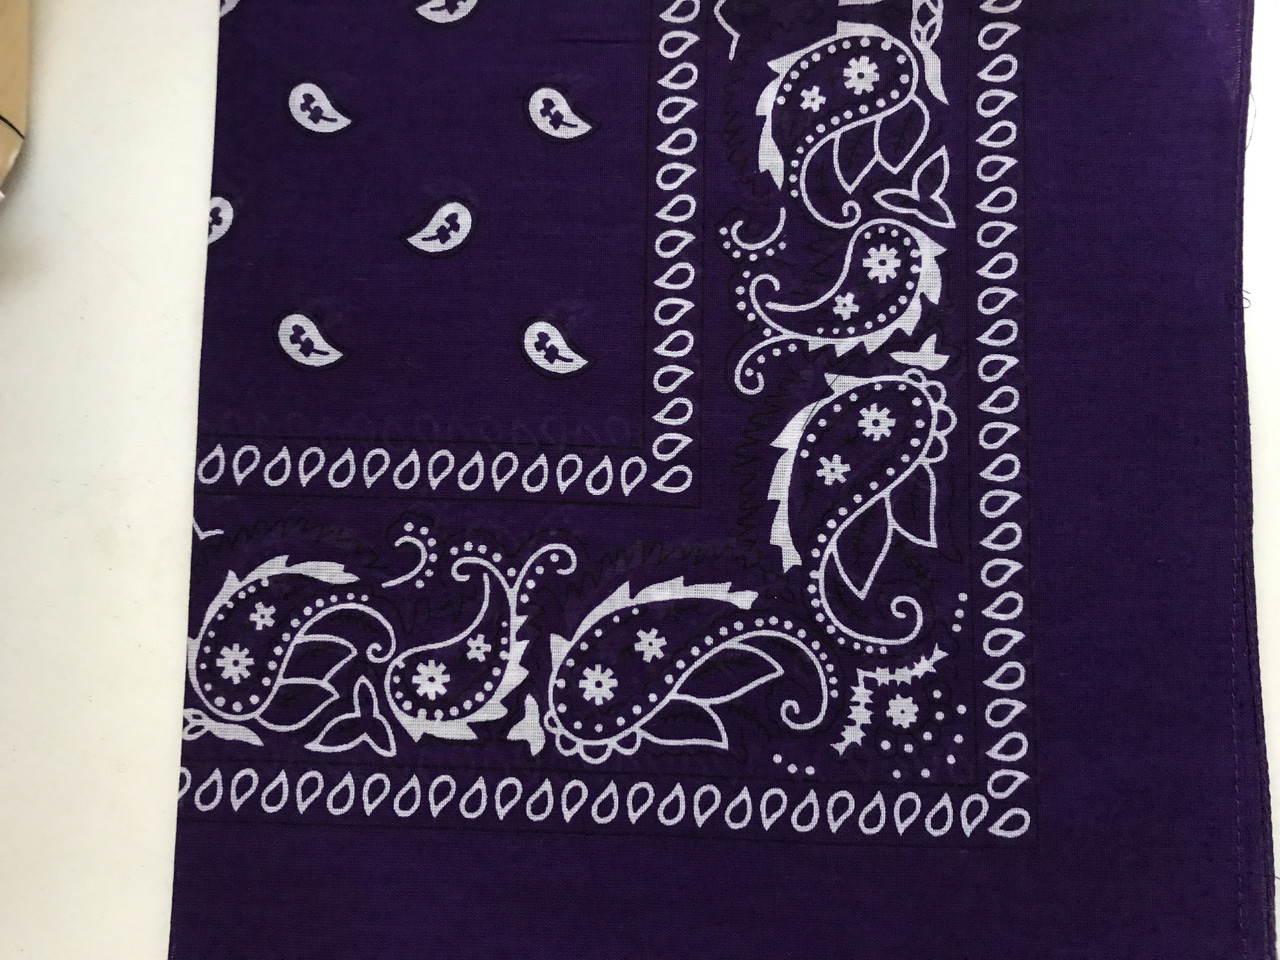 Хлопковая бандана (косынка) фиолетовая